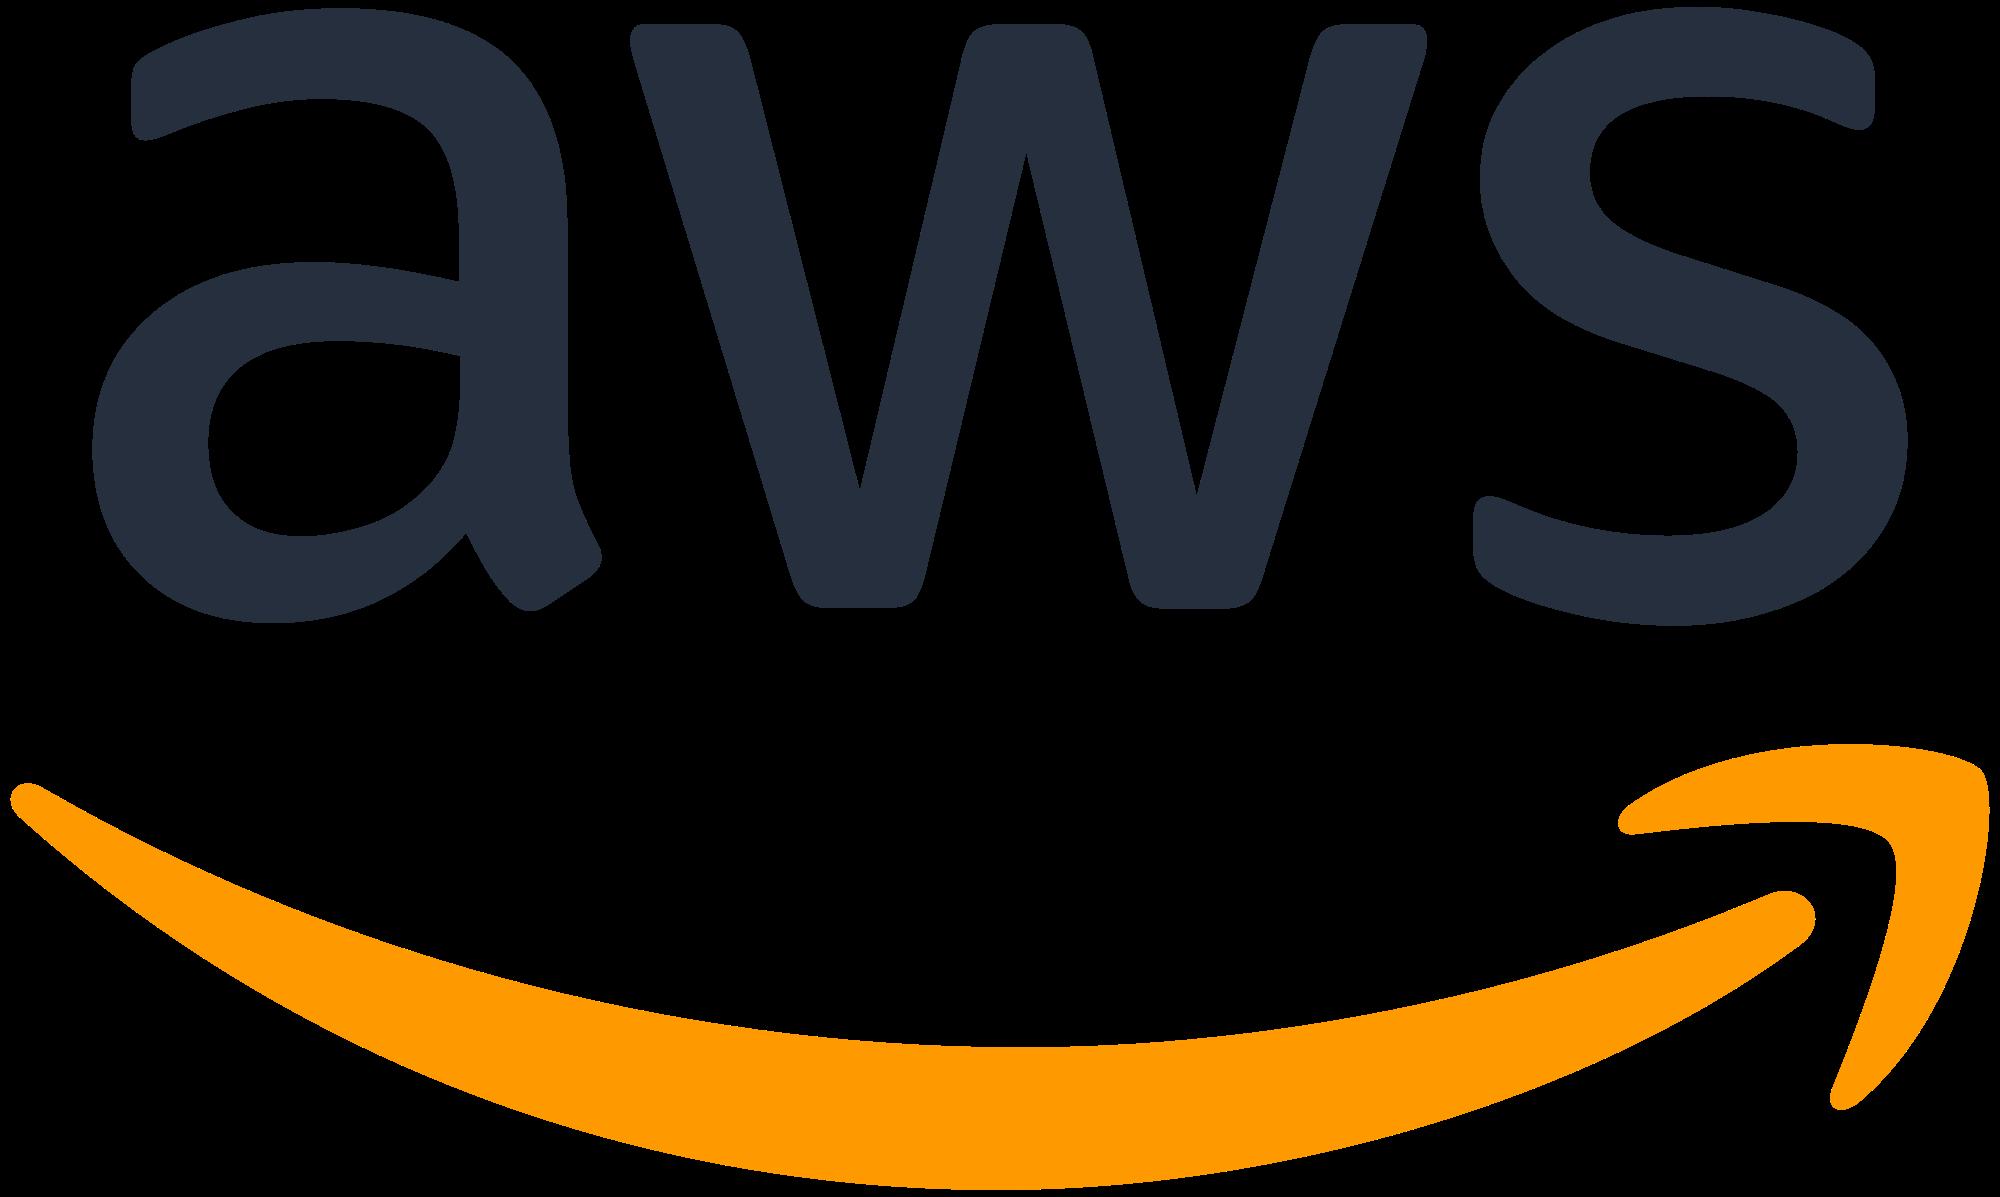 Amazon_Web_Services.png